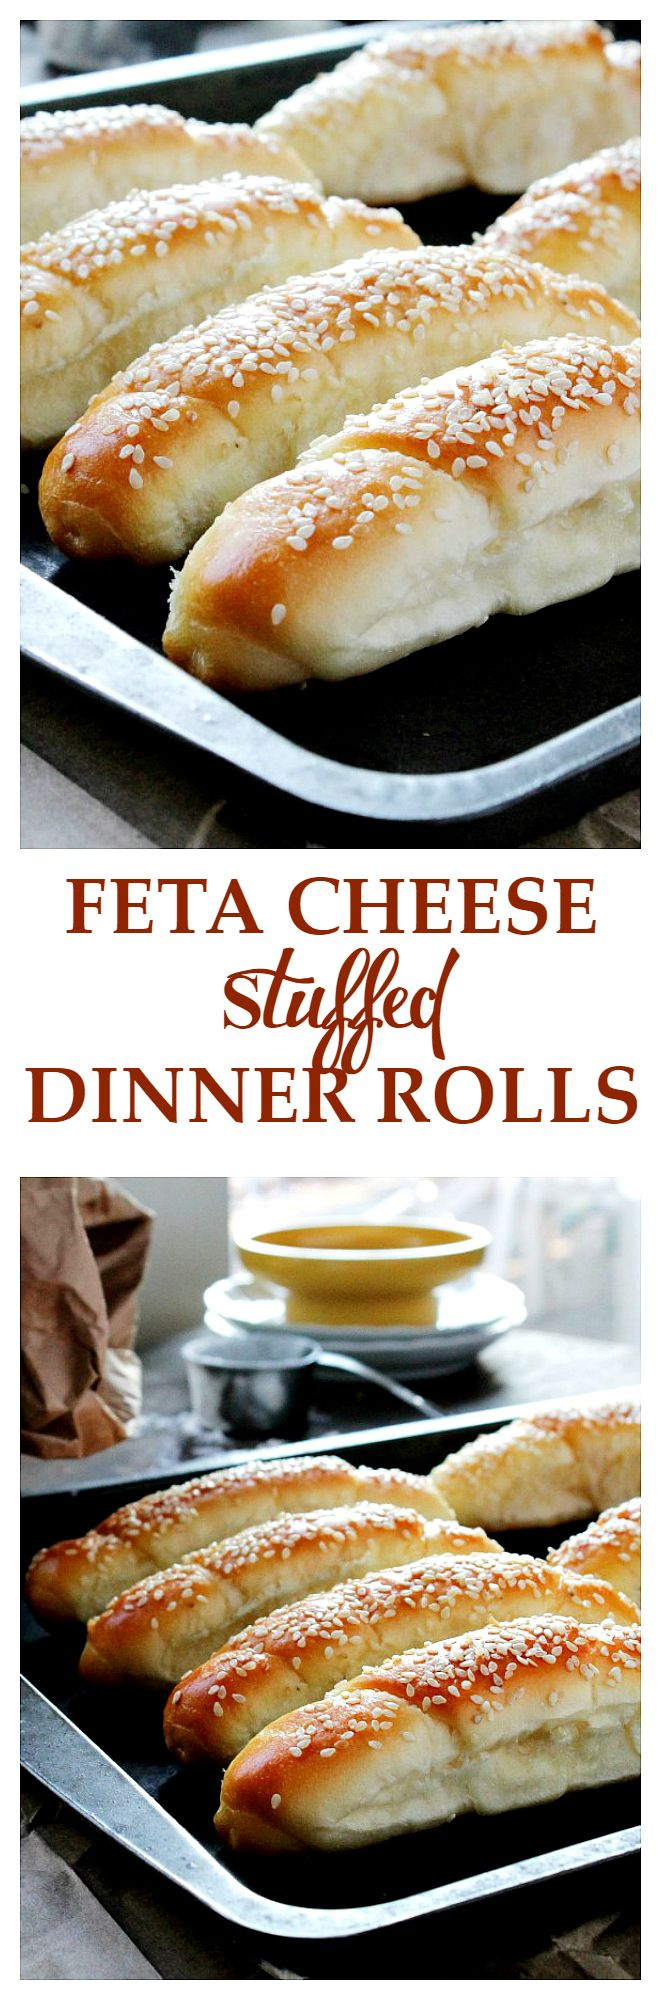 Feta Cheese Stuffed Dinner Rolls - Soft, tender, delicious dinner rolls stuffed with feta cheese. They are irresistible!!